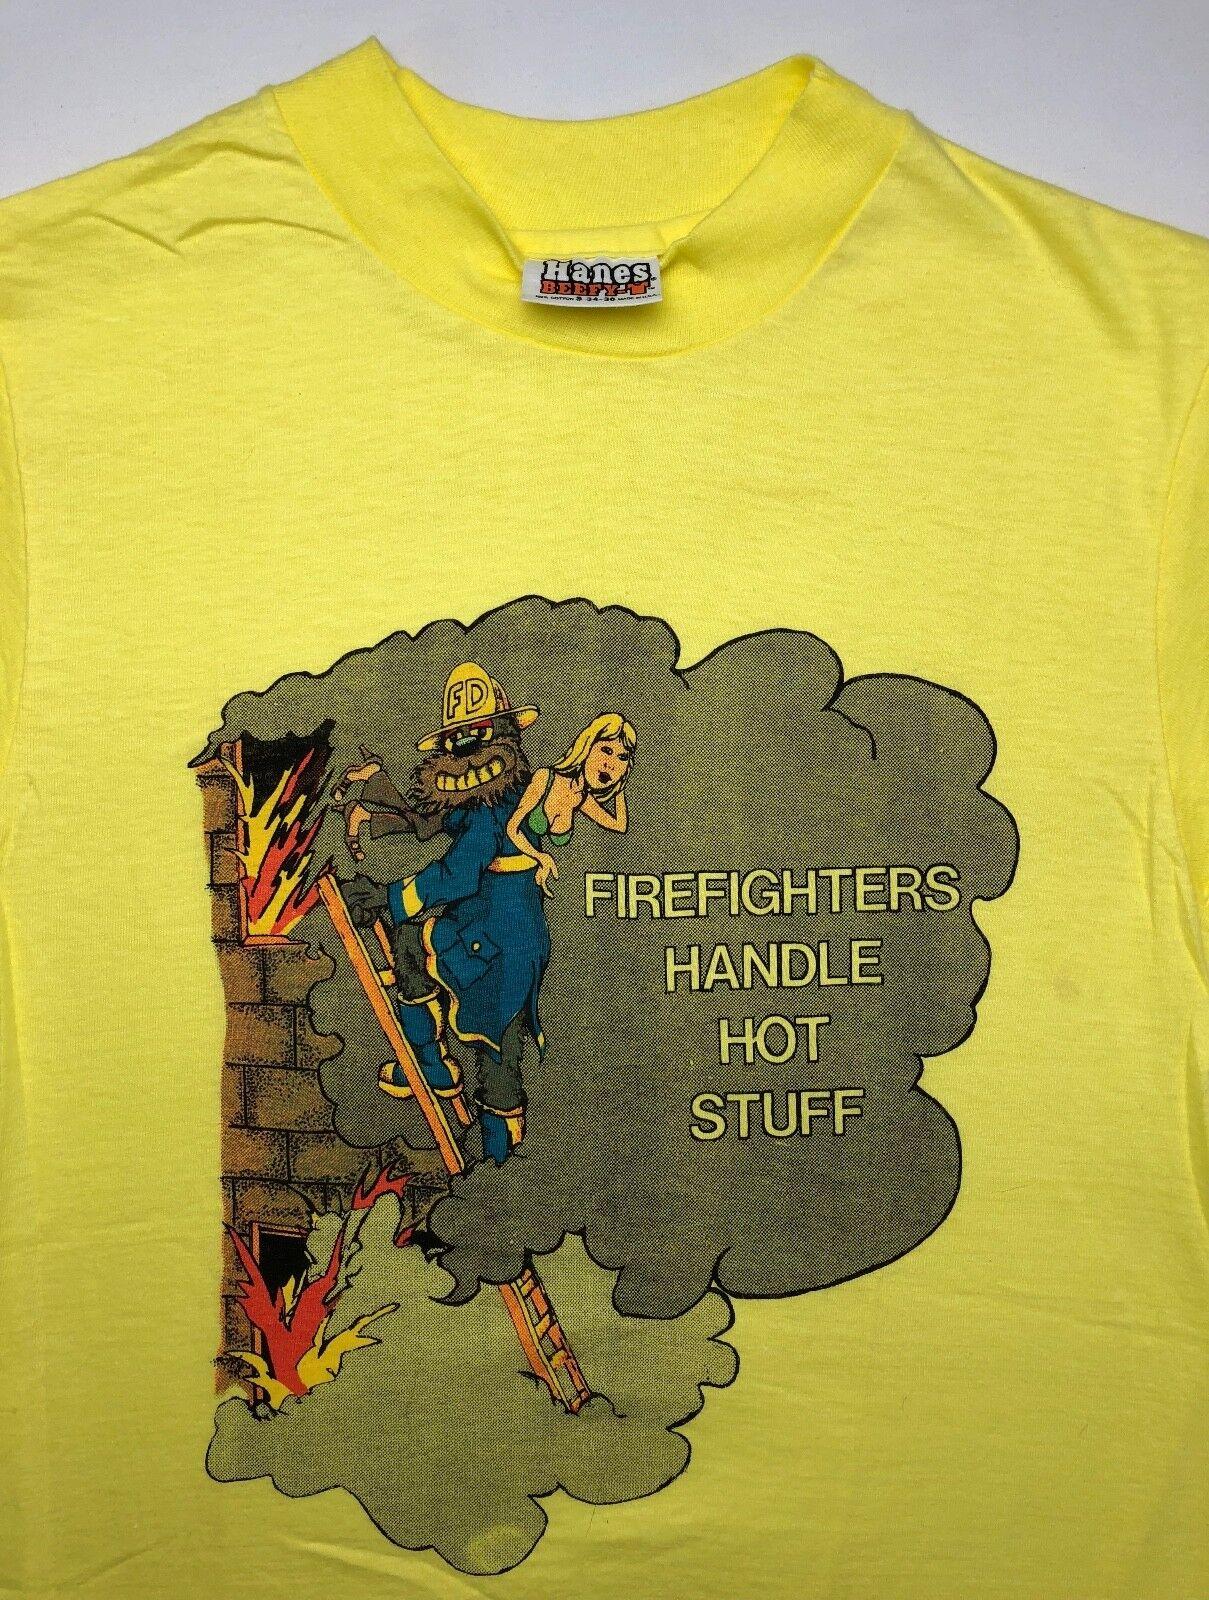 9efc93e6 Mens S 70s Hanes Firefighters Handle Stuff Neon Yellow NOS T-Shirt Vintage  Hot nihzoj2534-T-Shirts